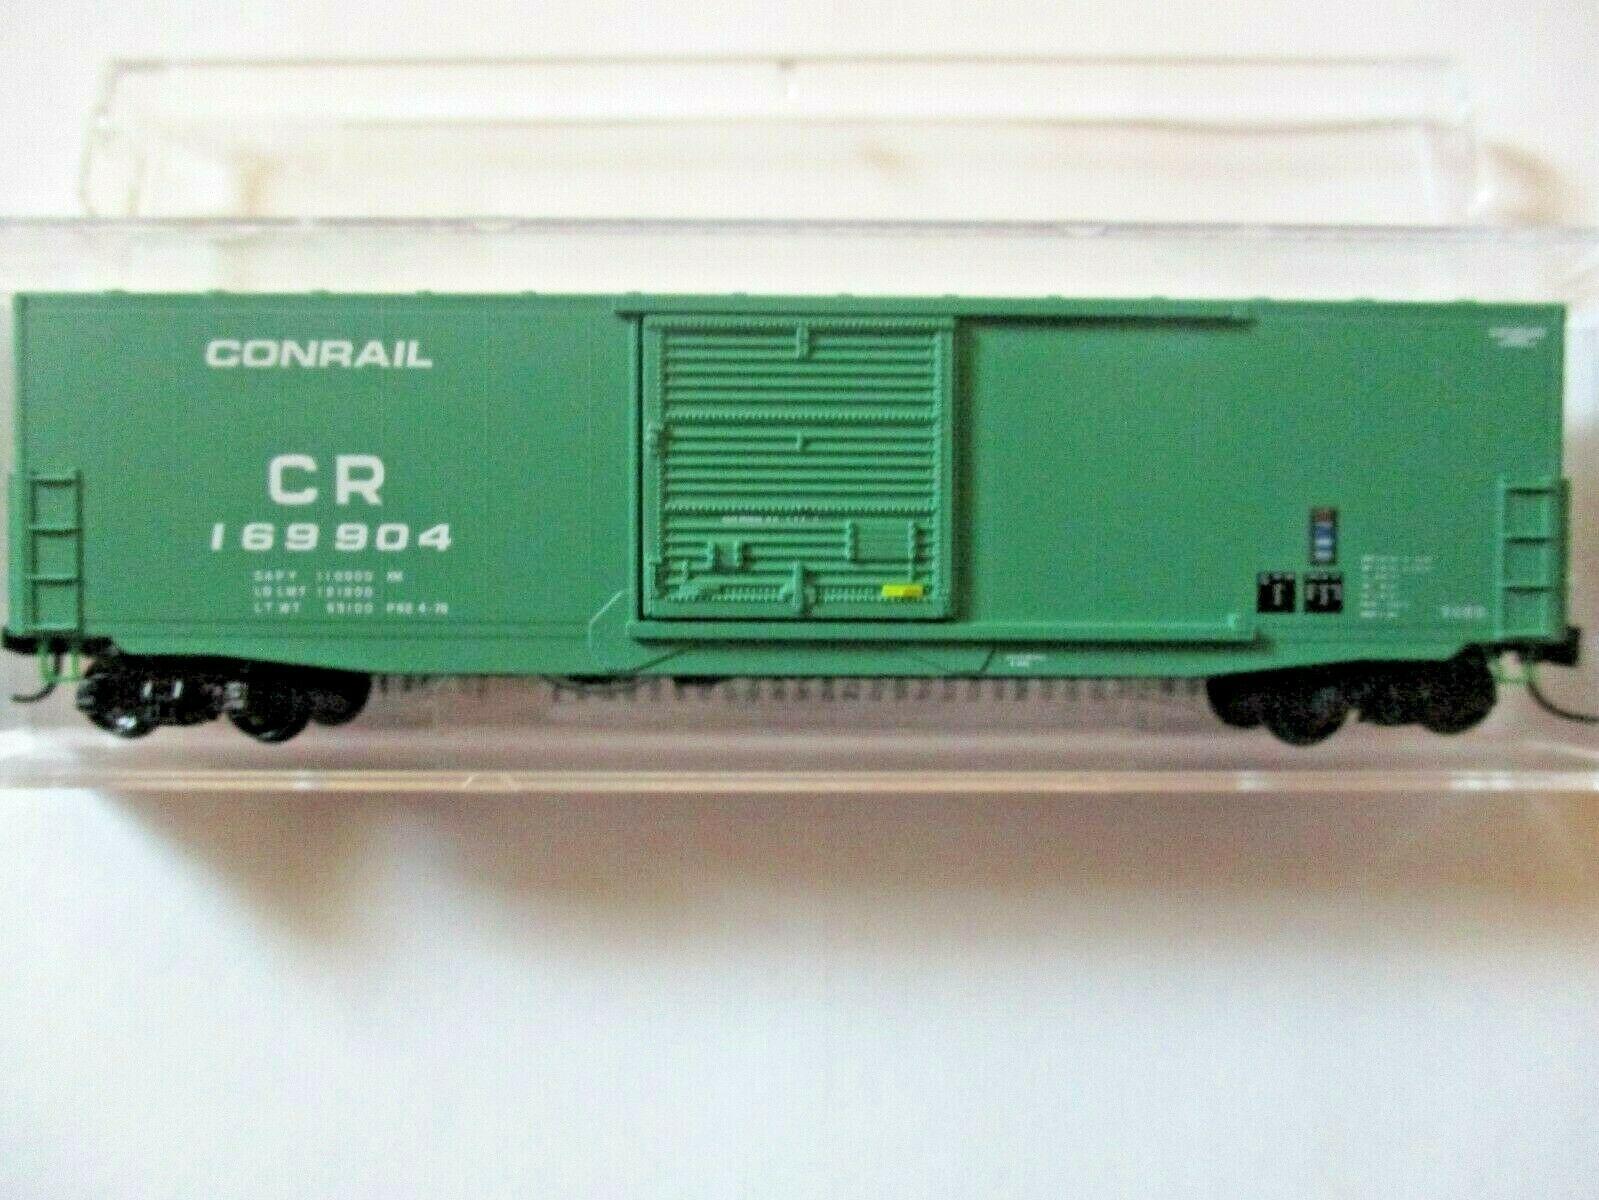 Micro-Trains # 18000230 Conrail 50' Standard Boxcar N-Scale